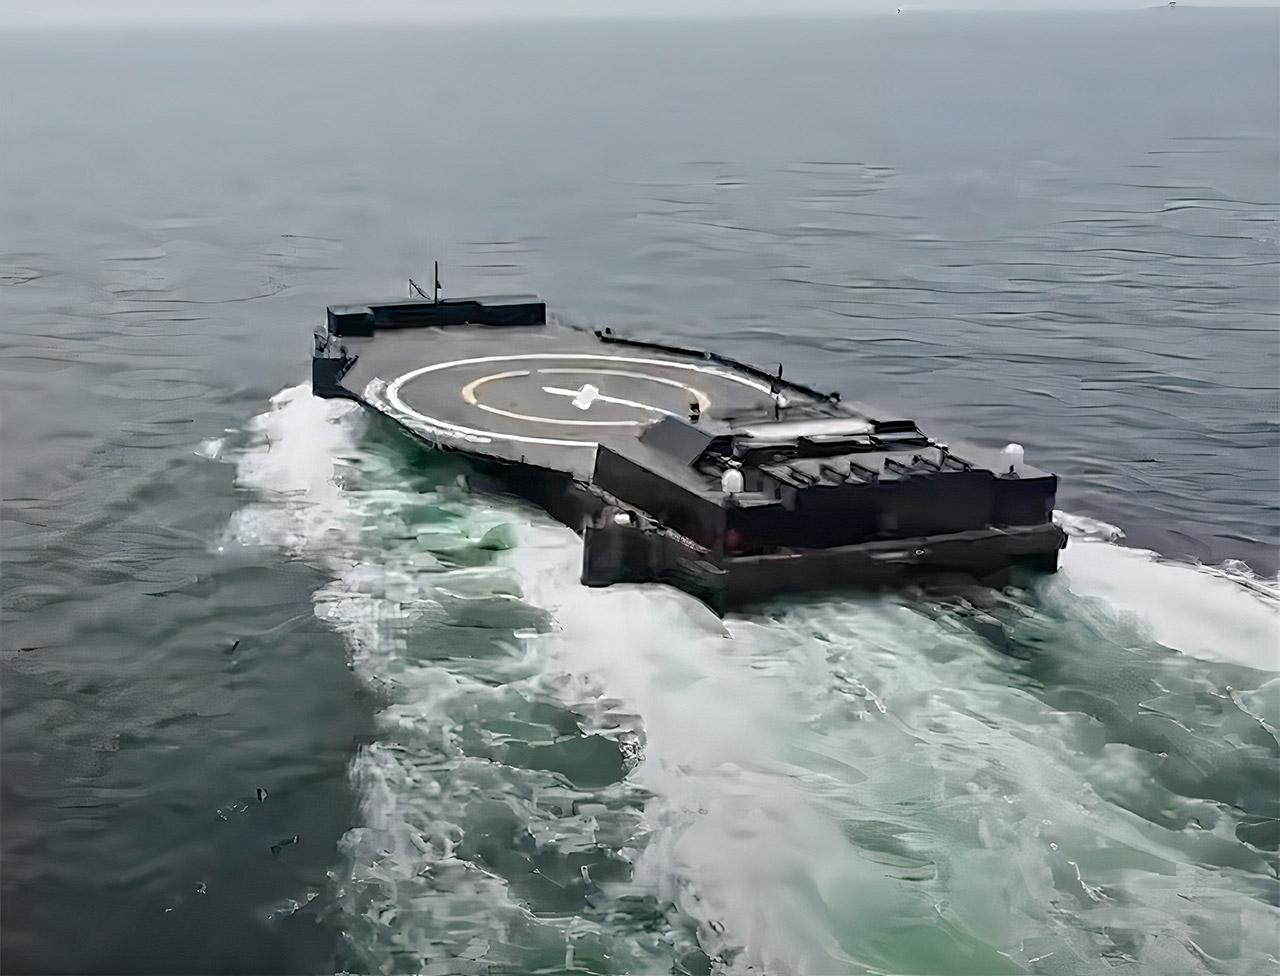 Elon Musk SpaceX Autonomous Spaceport Drone Ship A Shortfall of Gravitas